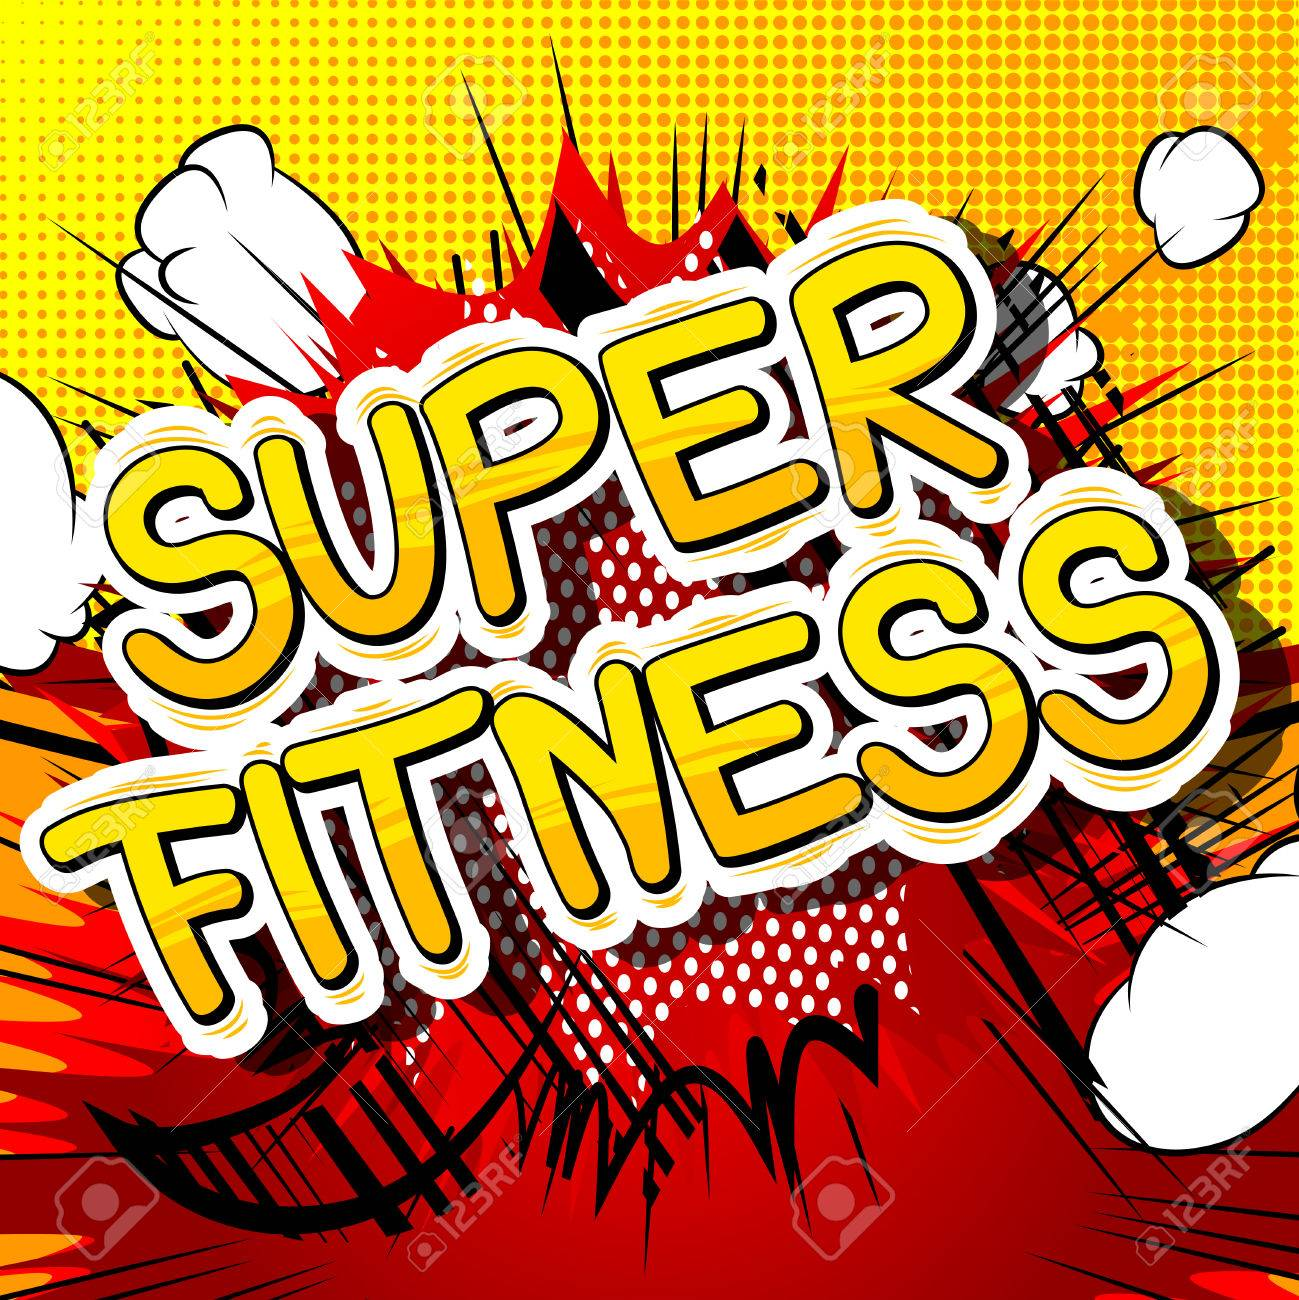 Super Fitness Frase De Estilo Cómic Sobre Fondo Abstracto